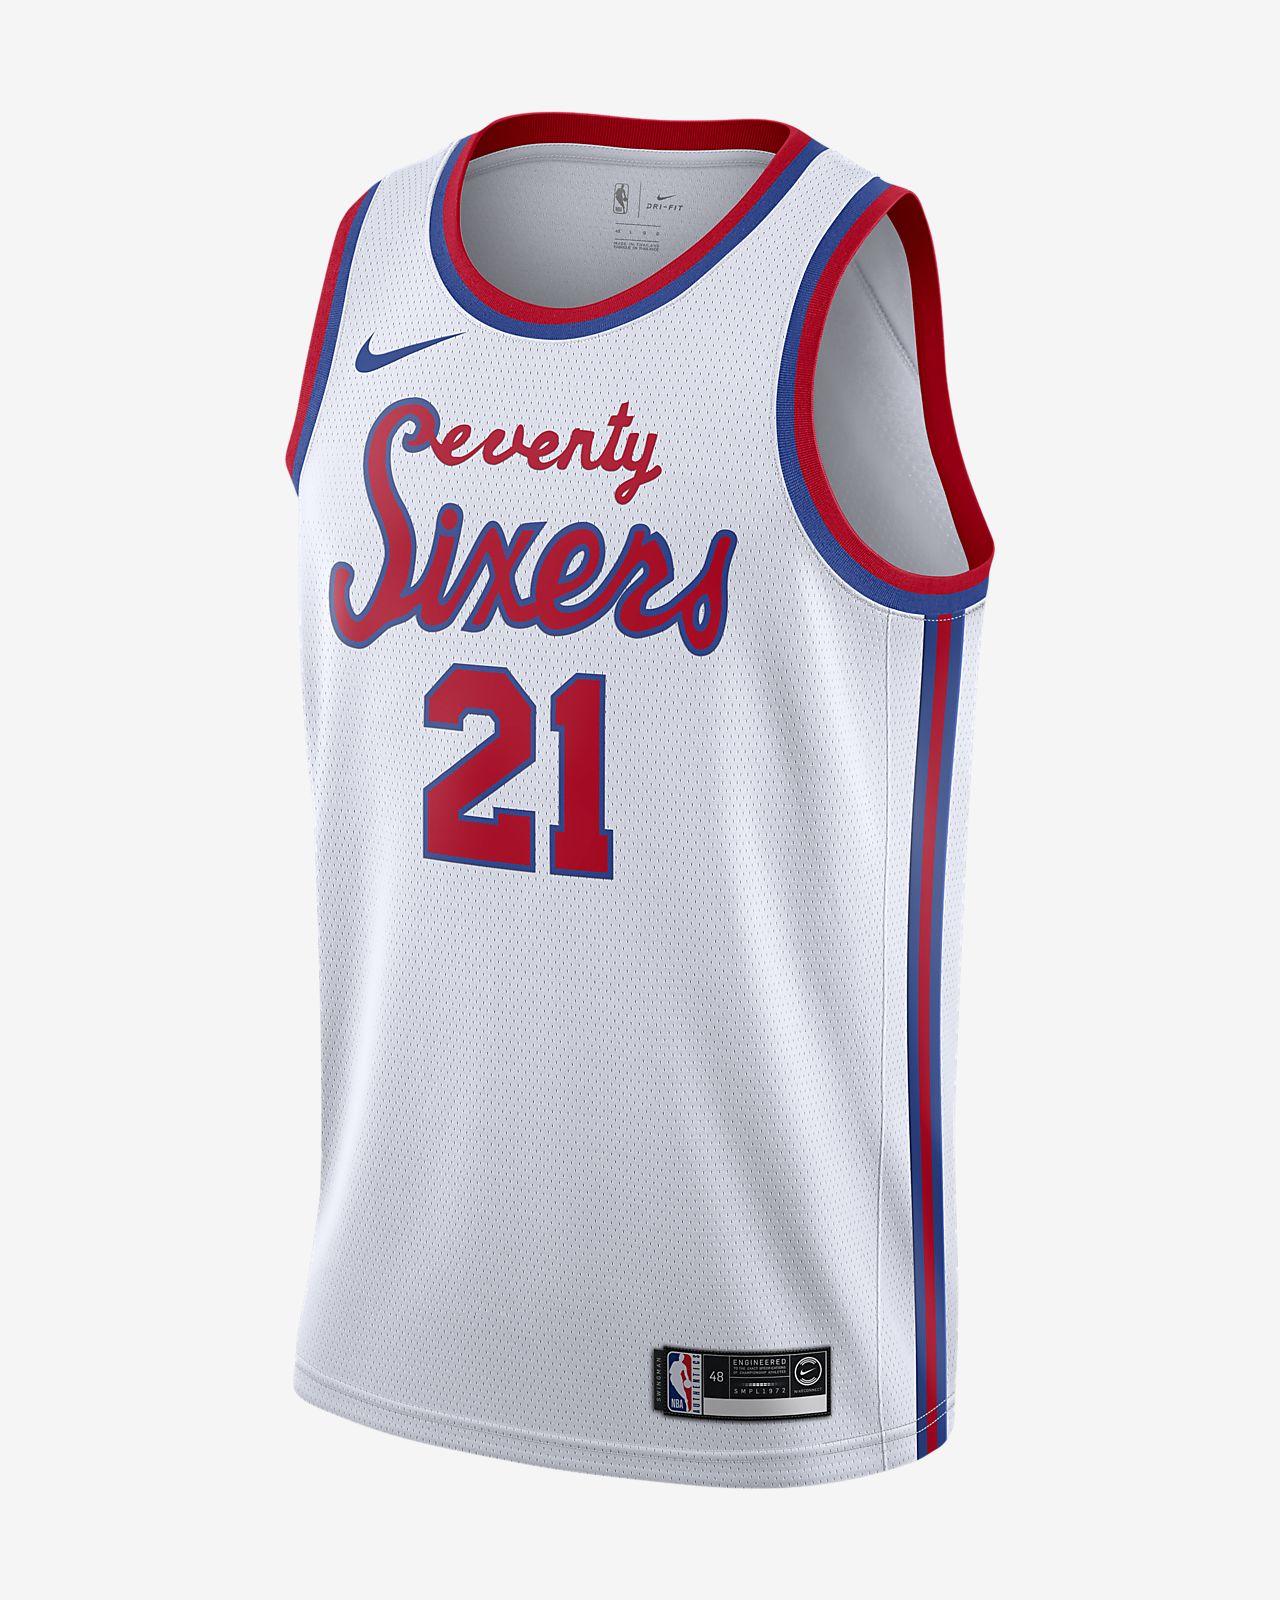 Joel Embiid 76ers Classic Edition Nike NBA Swingman Jersey